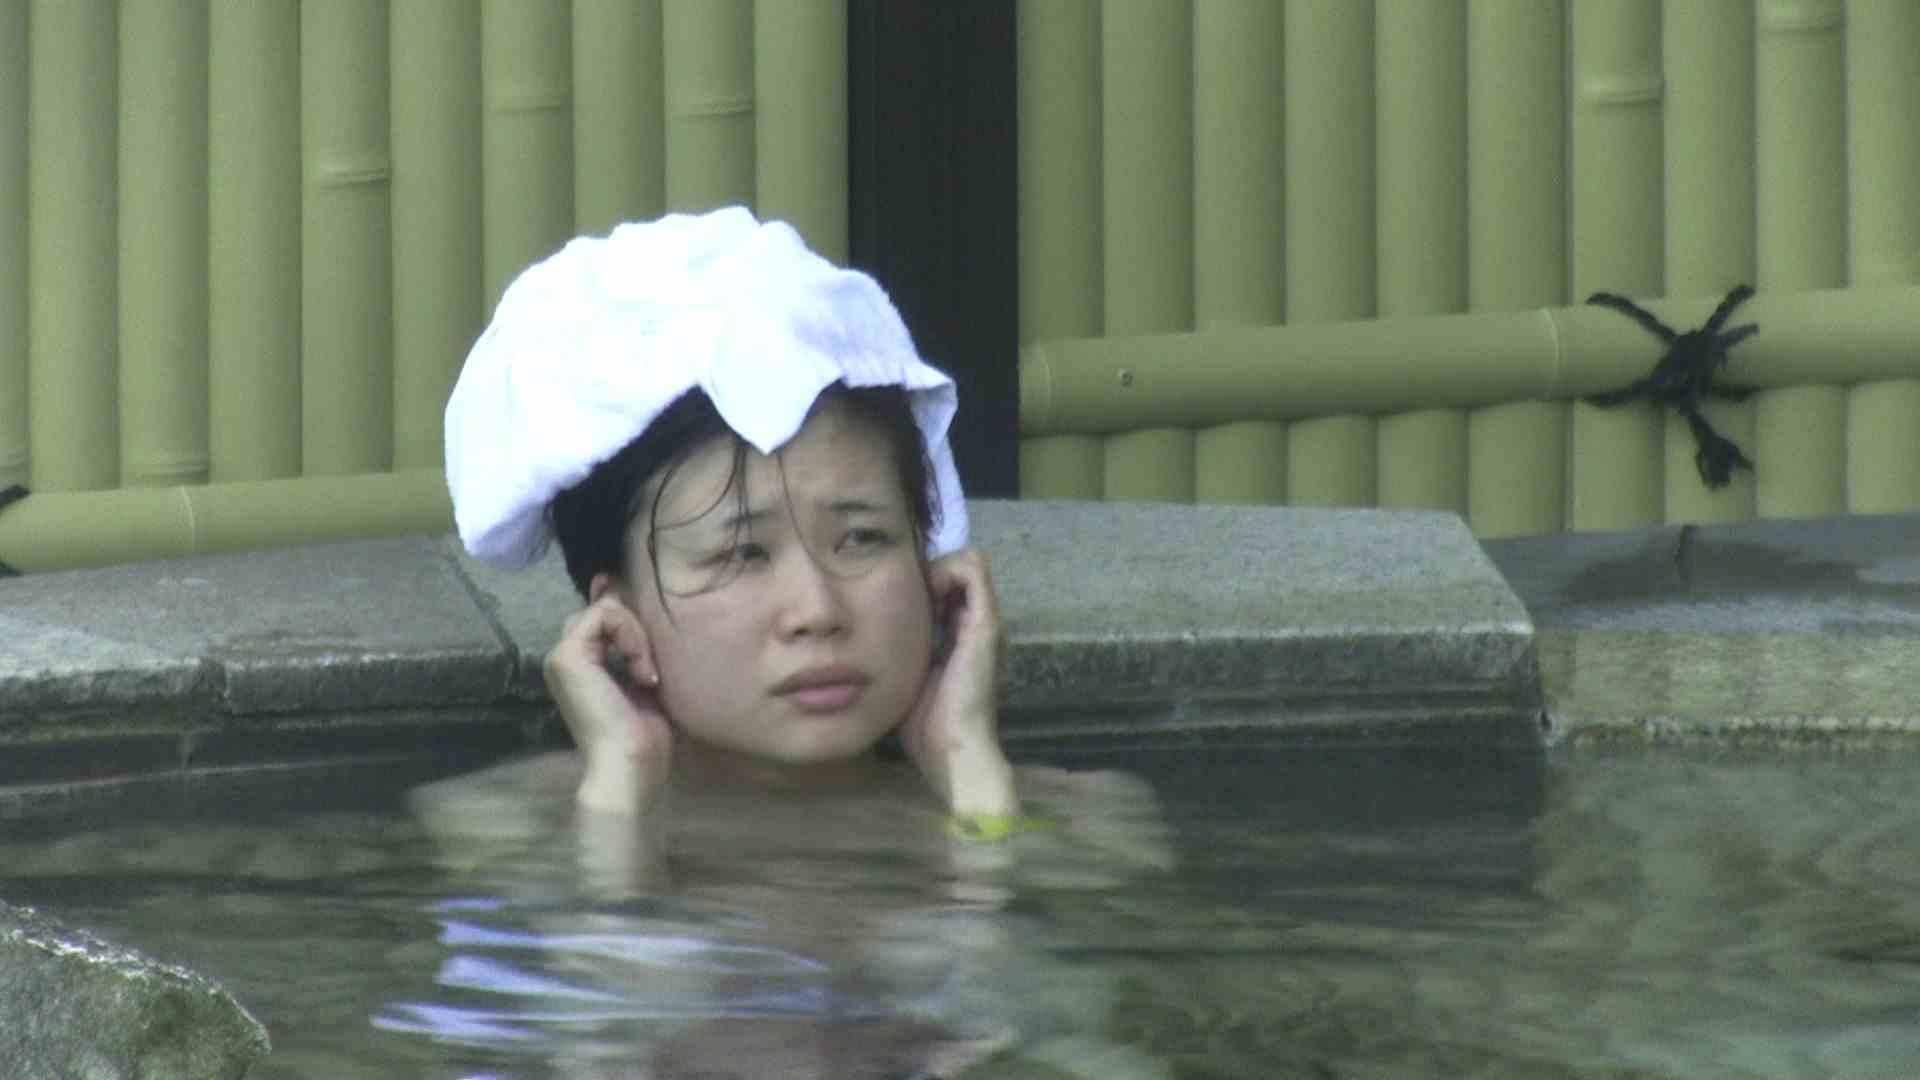 Aquaな露天風呂Vol.183 綺麗なOLたち  53枚 33